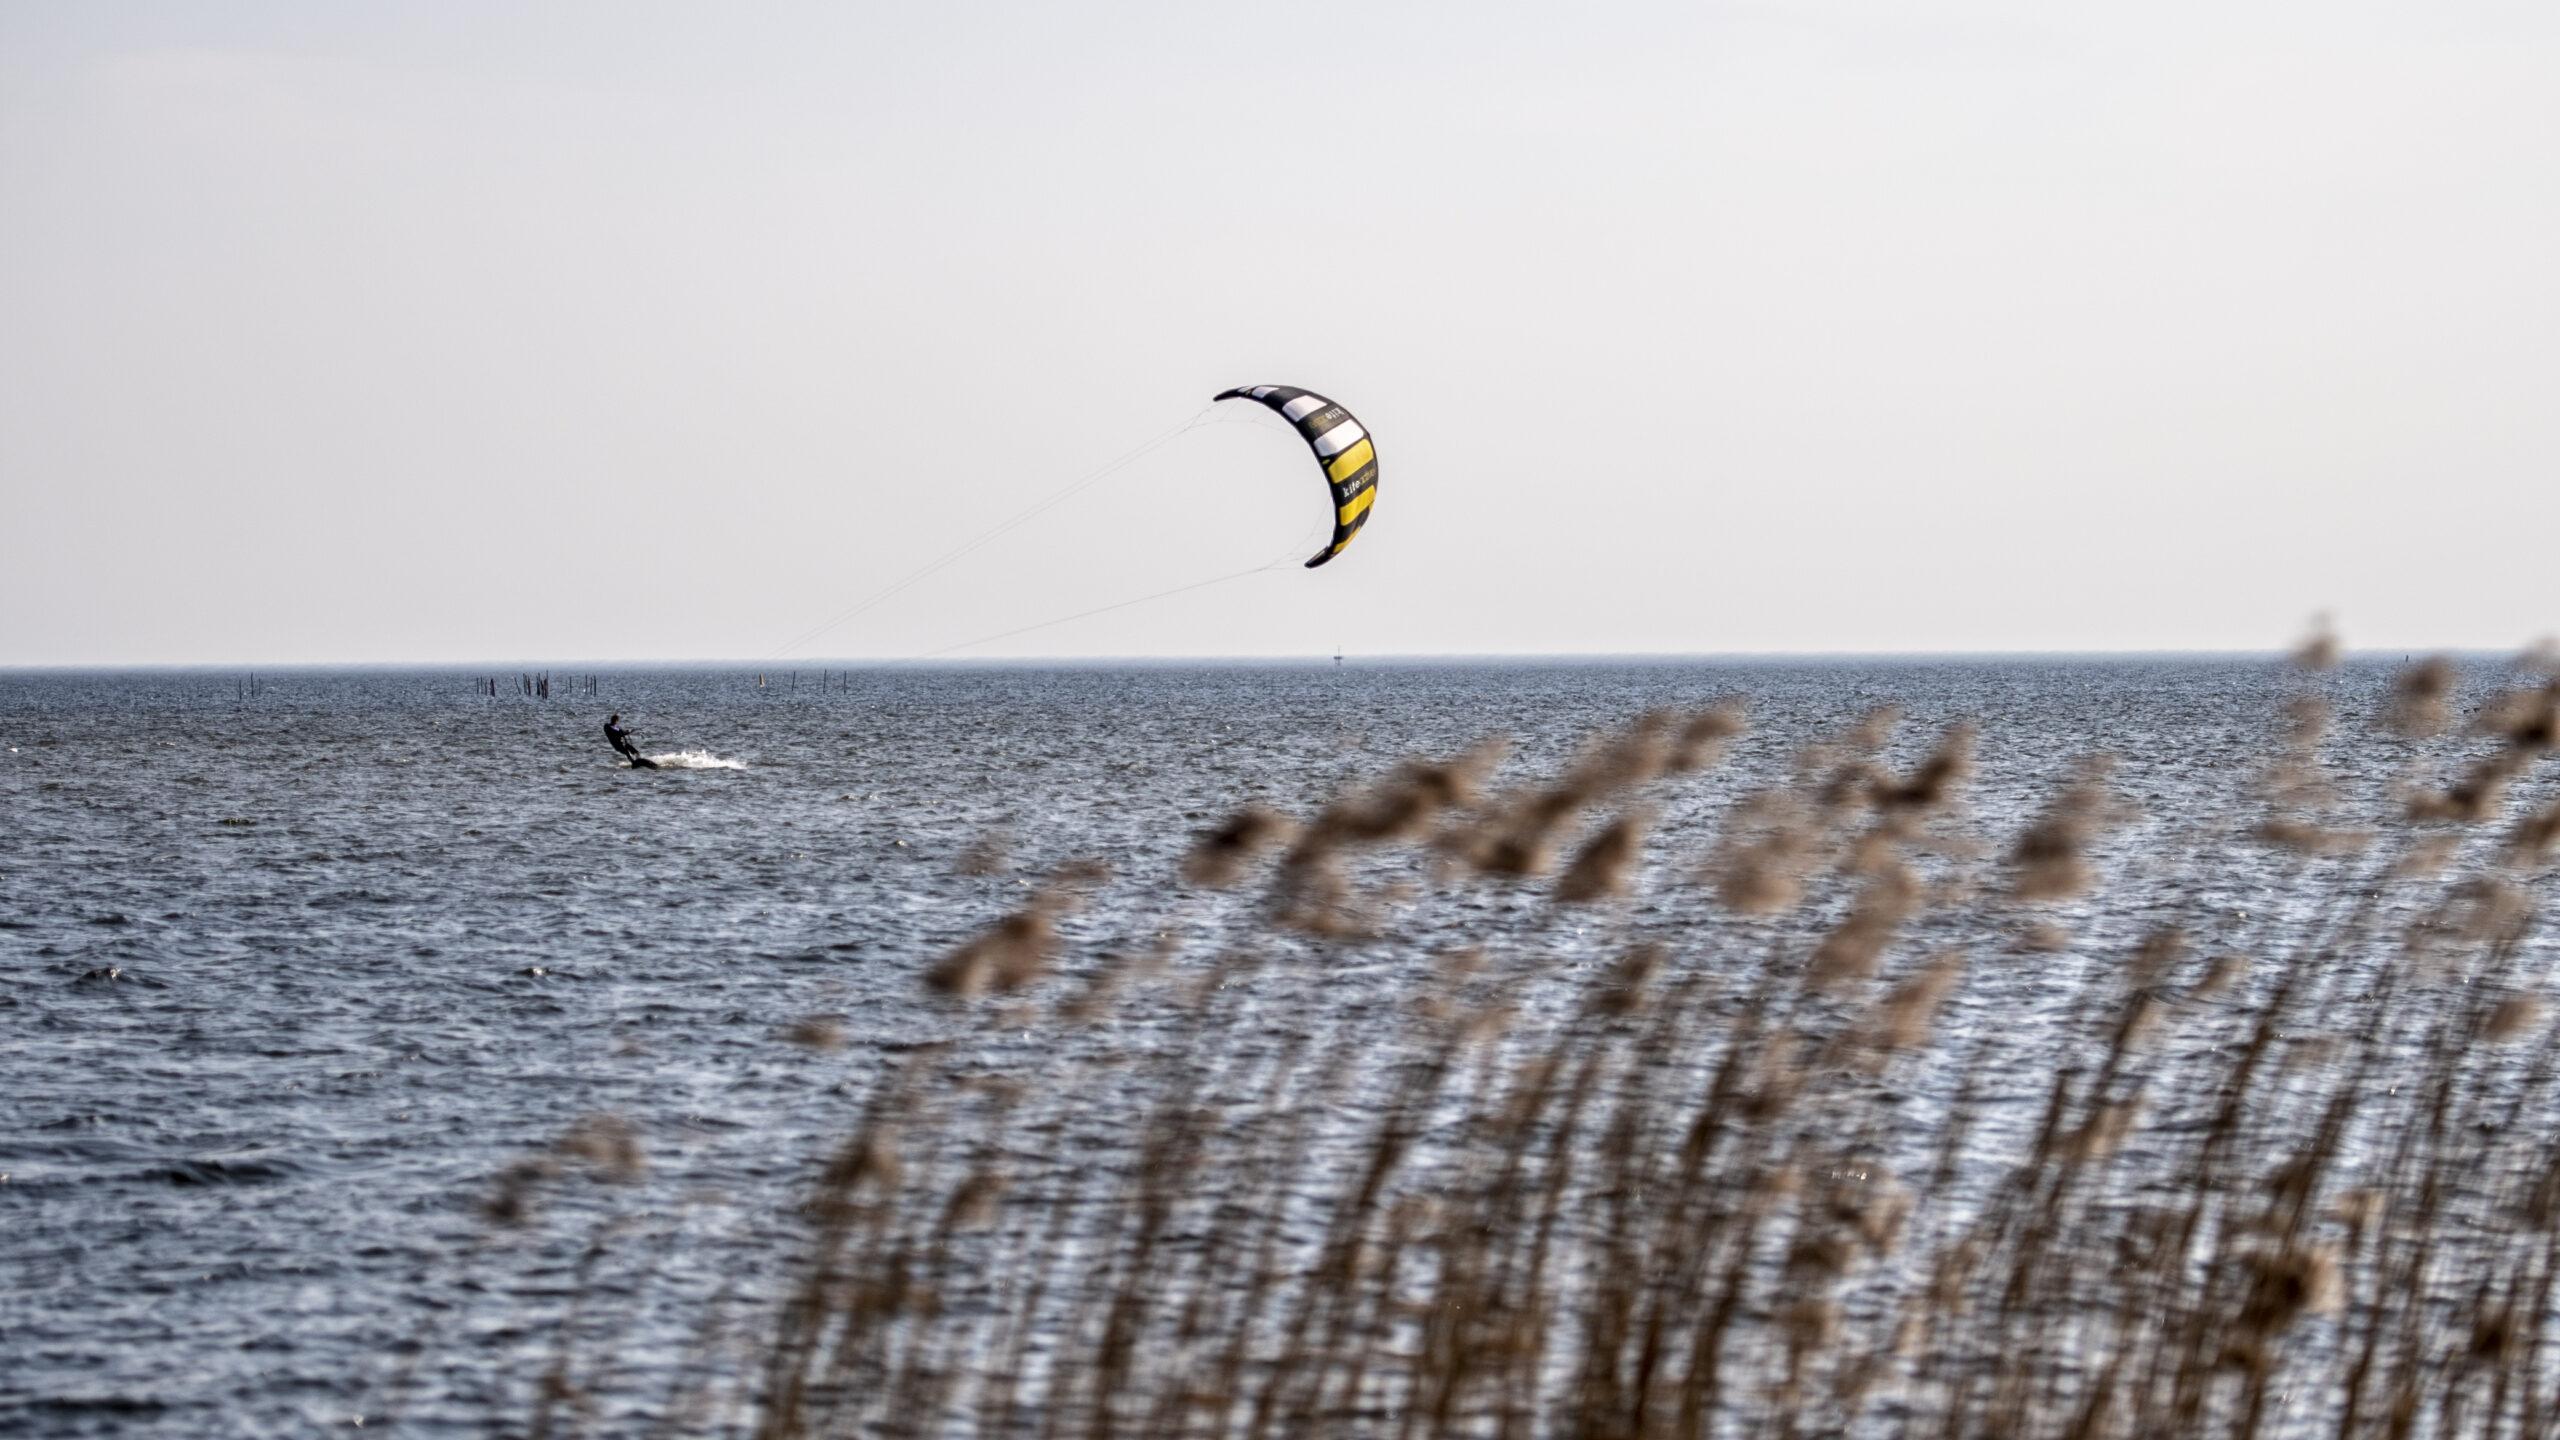 mirnser-klif-kitesurf